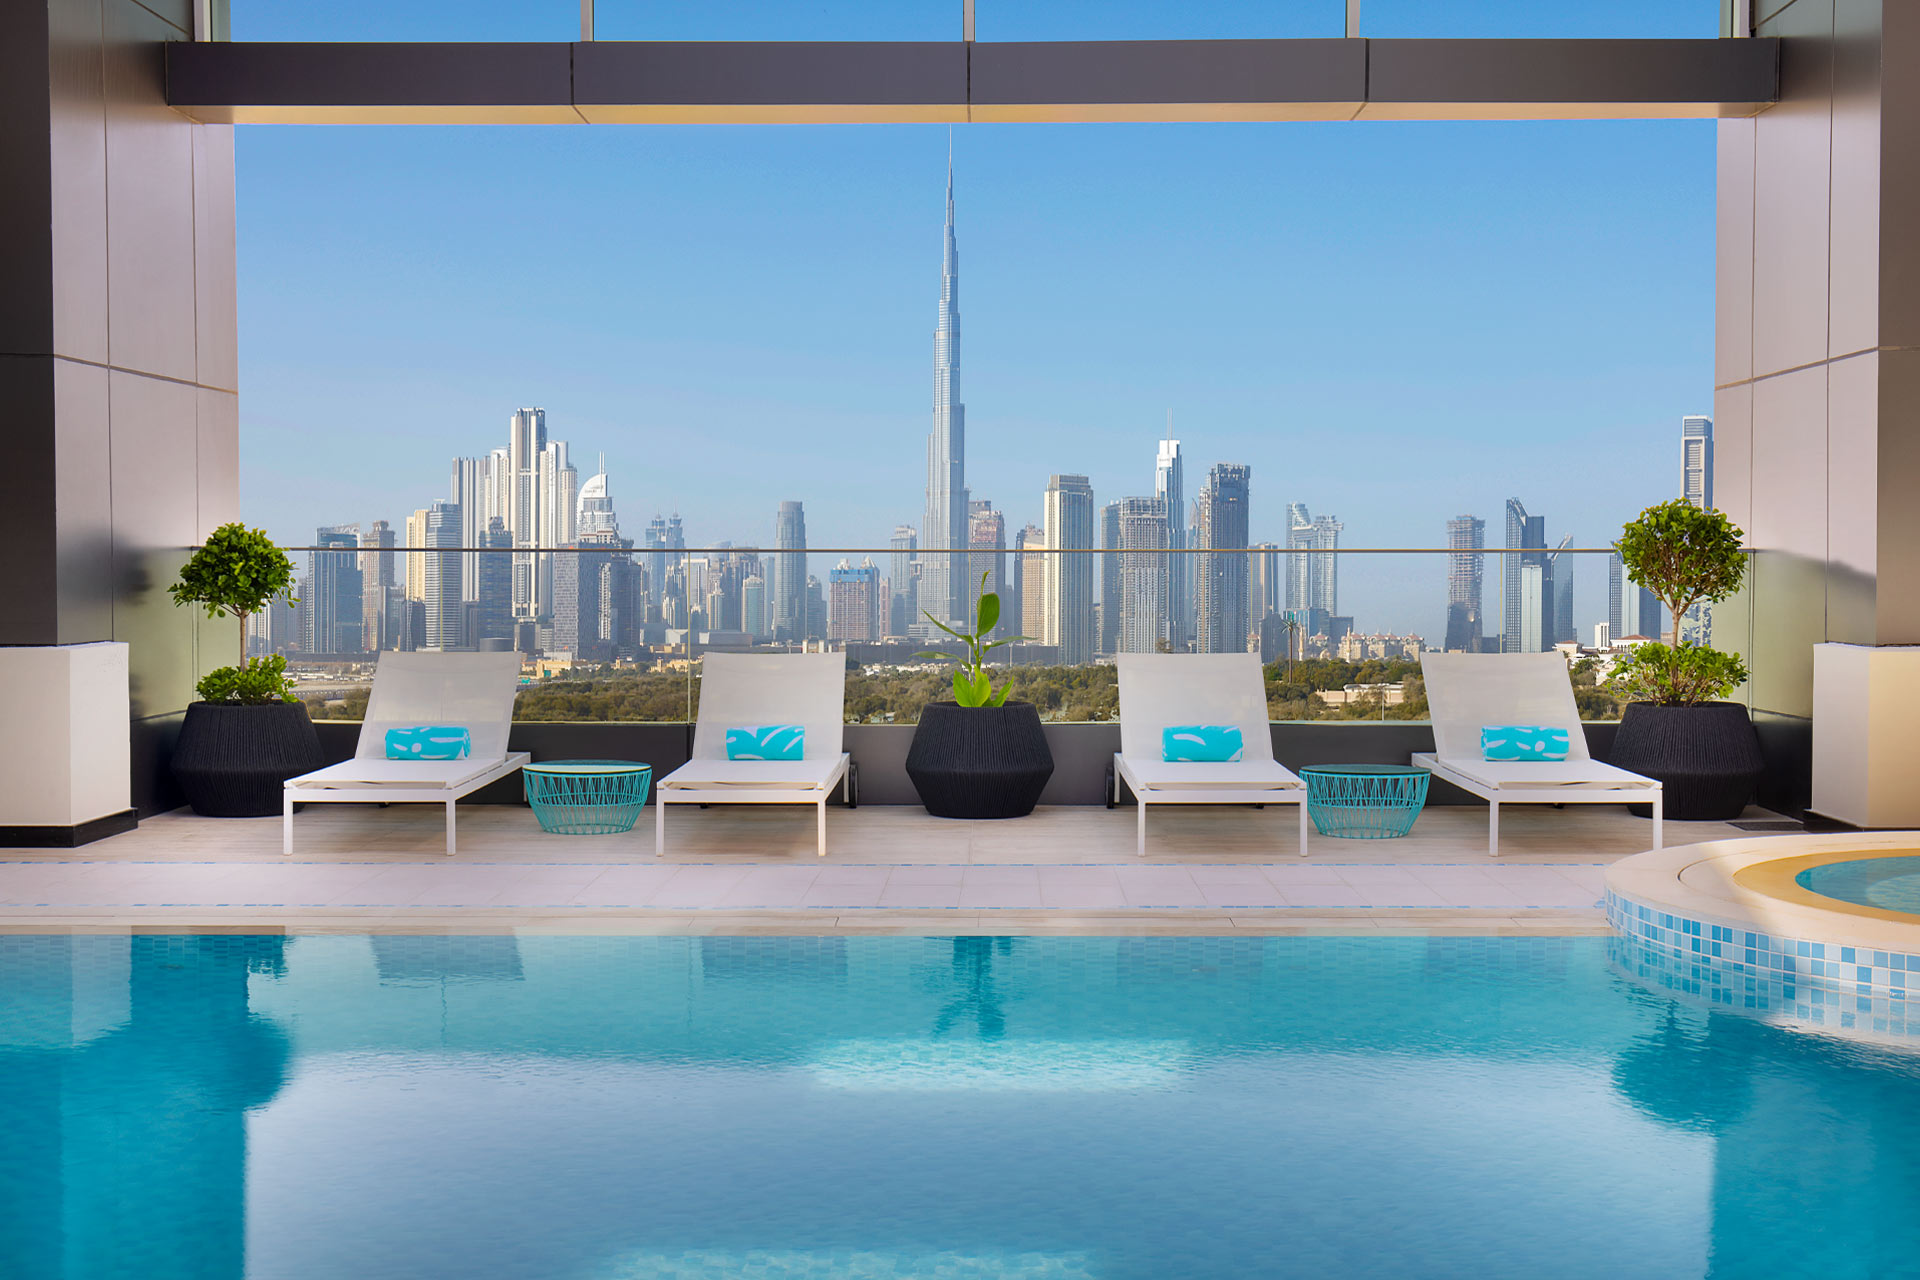 The pool at Residence Inn Al Jaddaf in Dubai